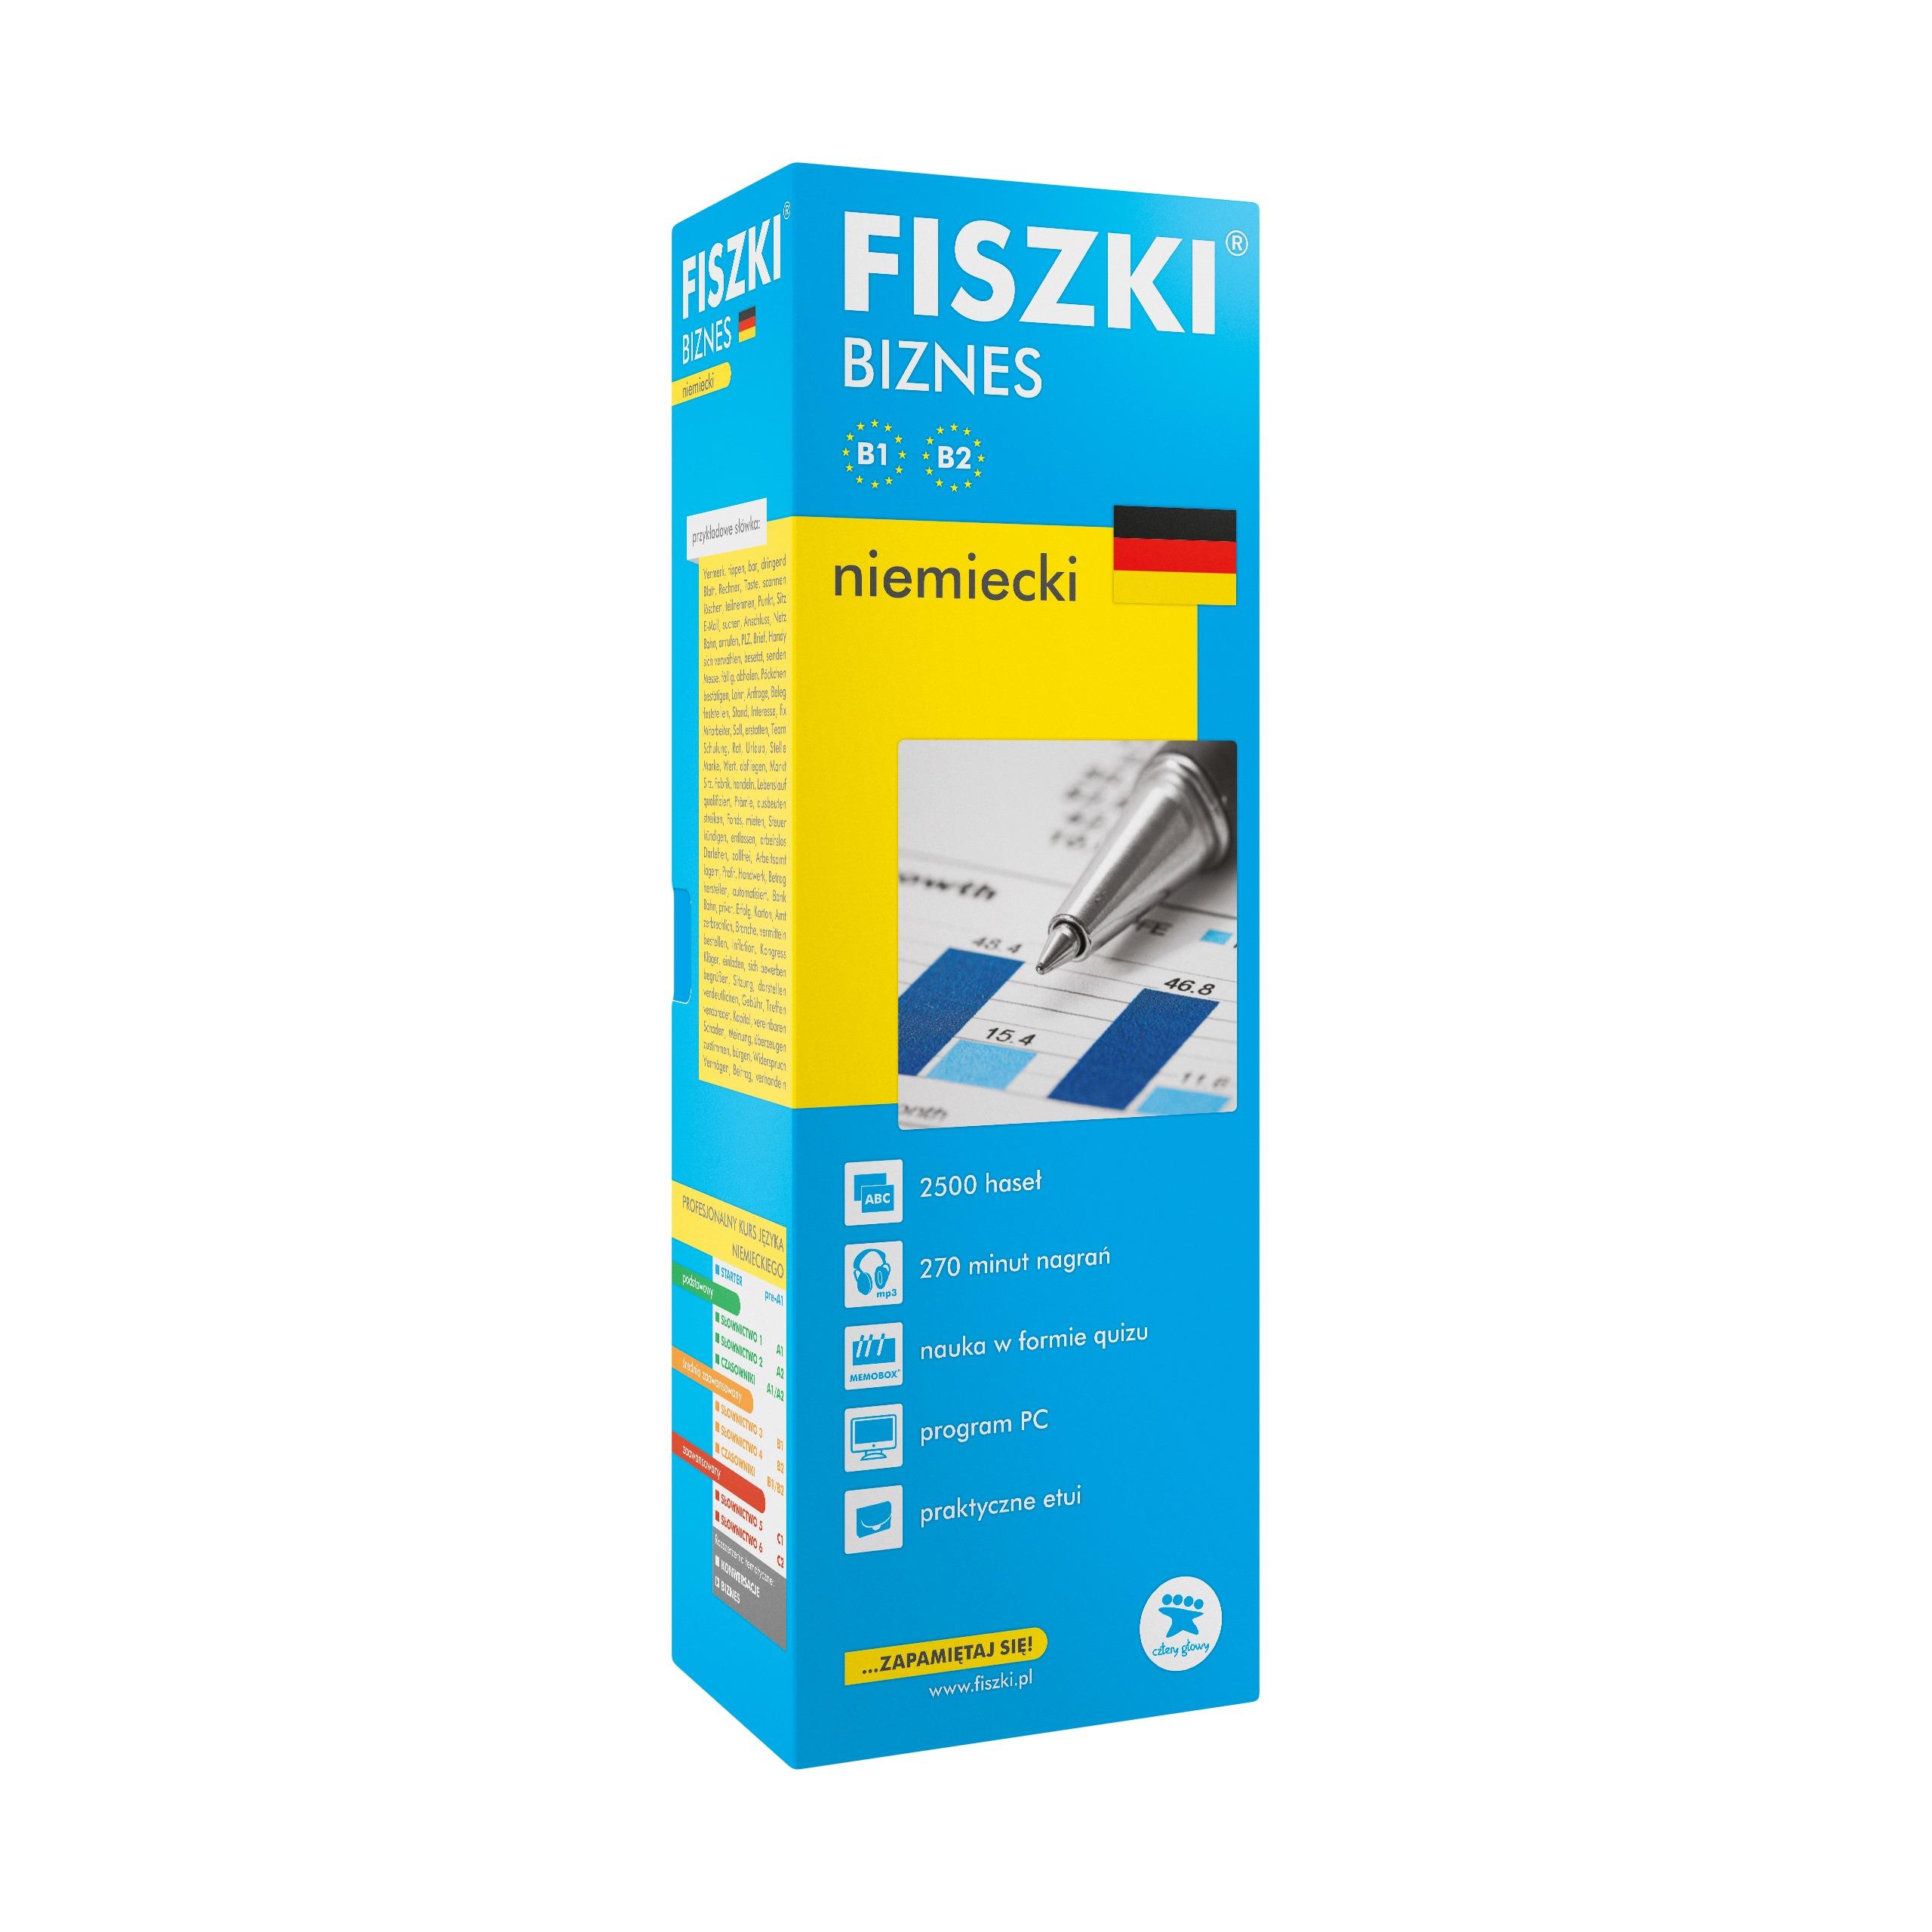 FISZKI - niemiecki - Biznes (B1-B2)